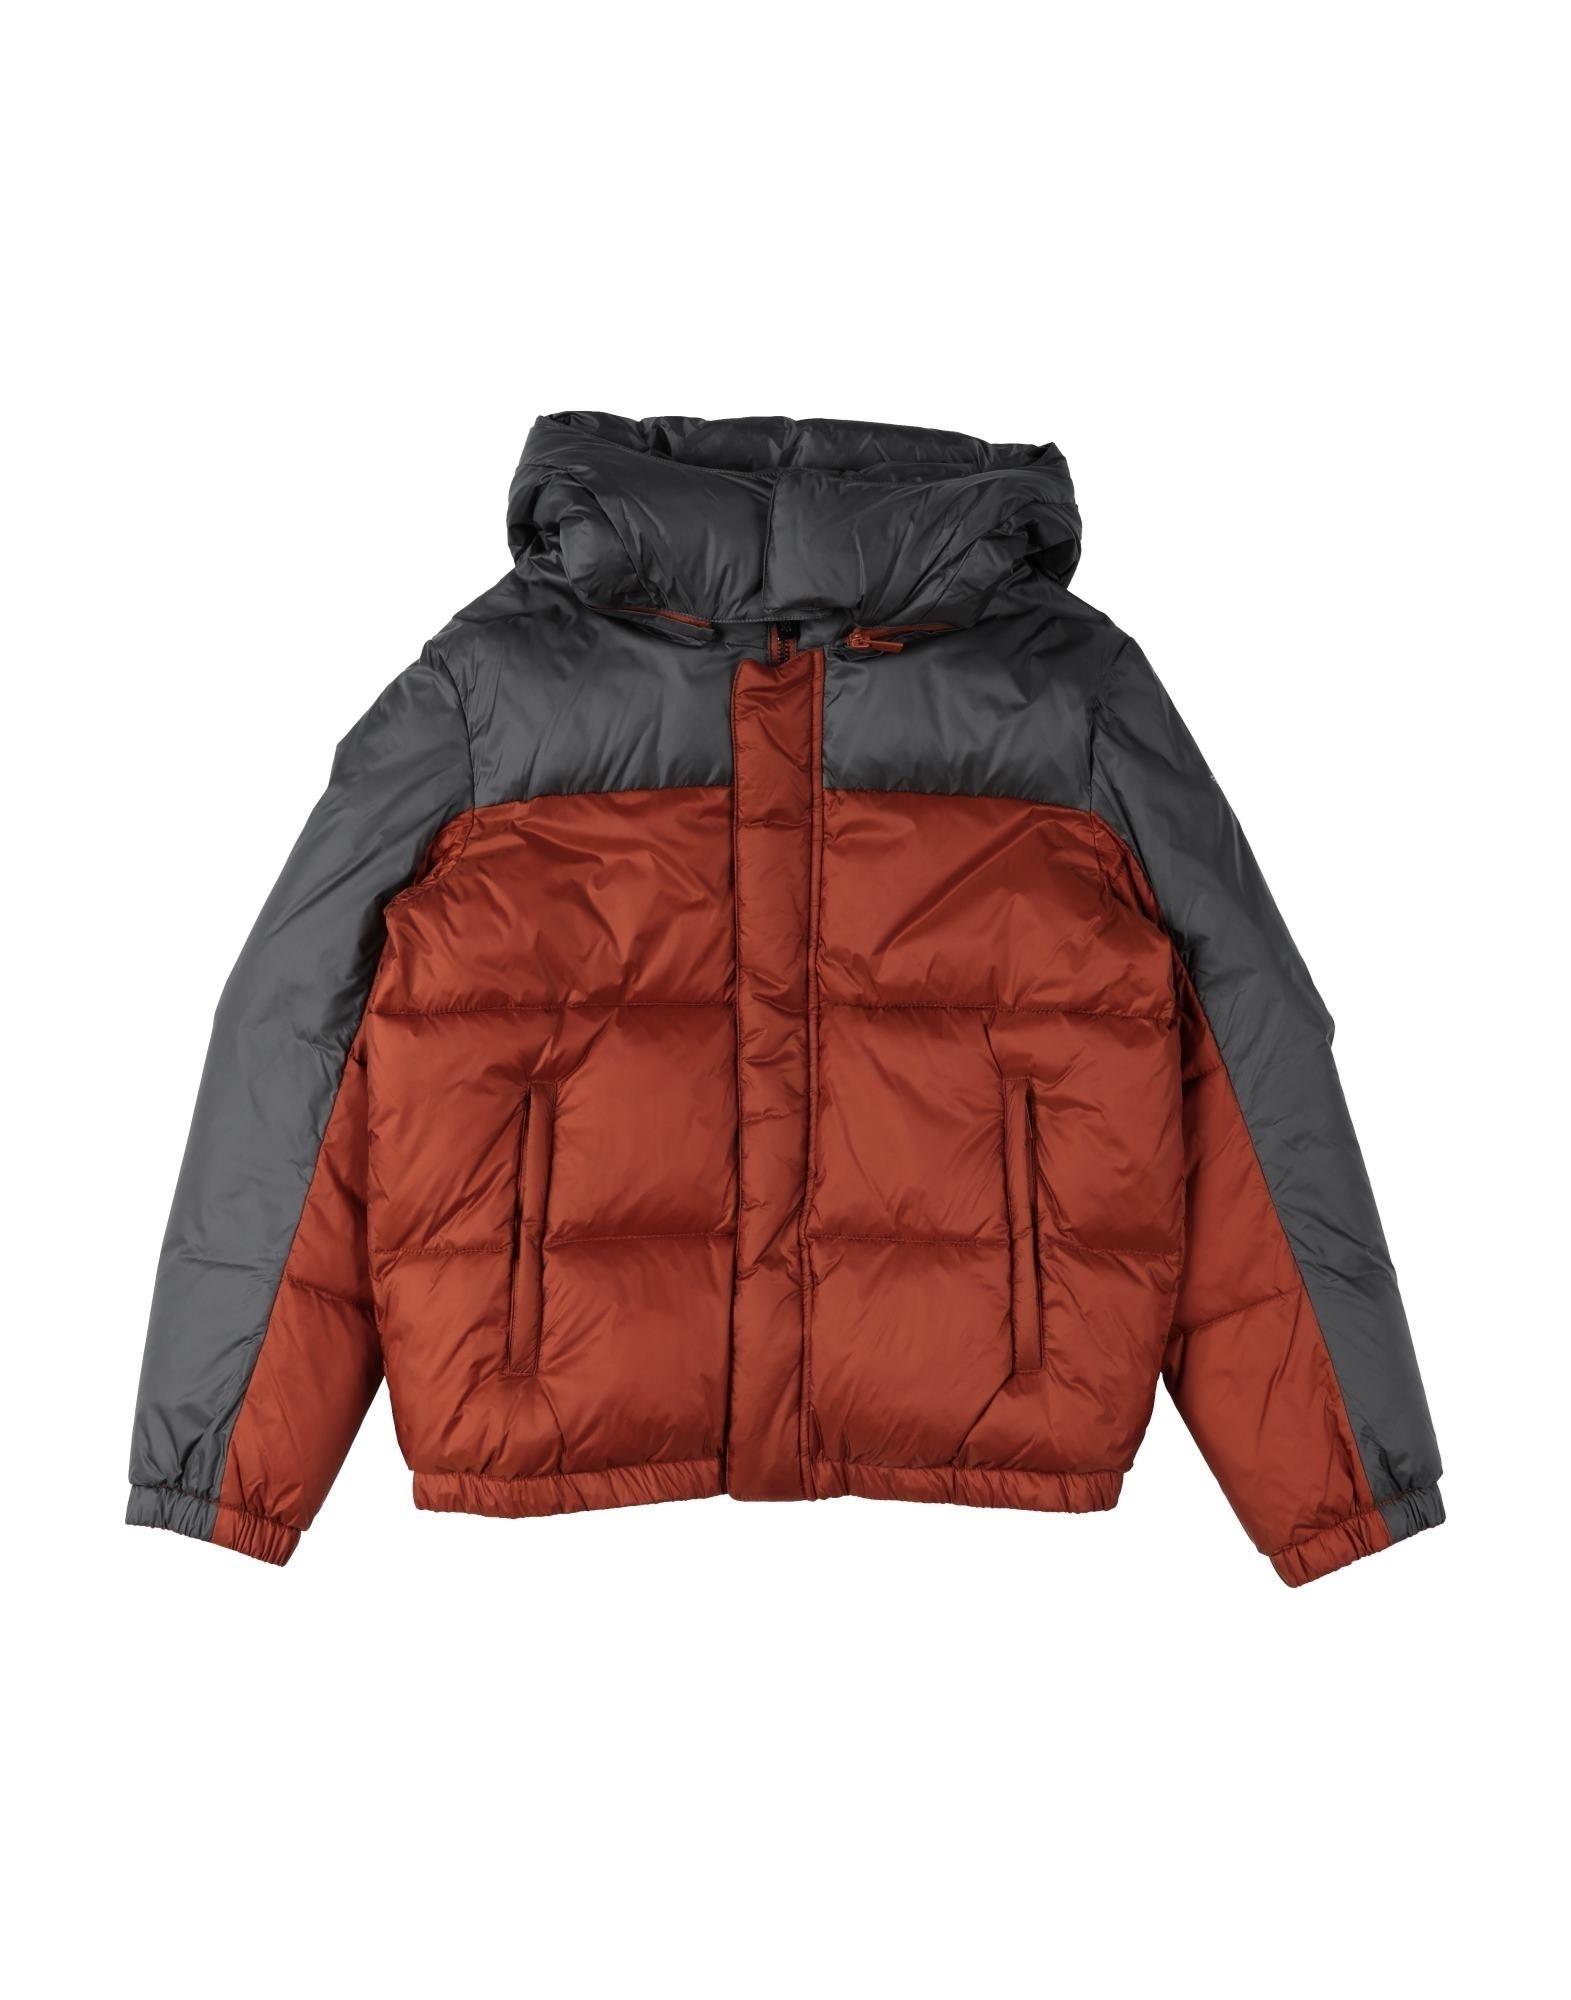 EMPORIO ARMANI Synthetic Down Jackets - Item 16000511